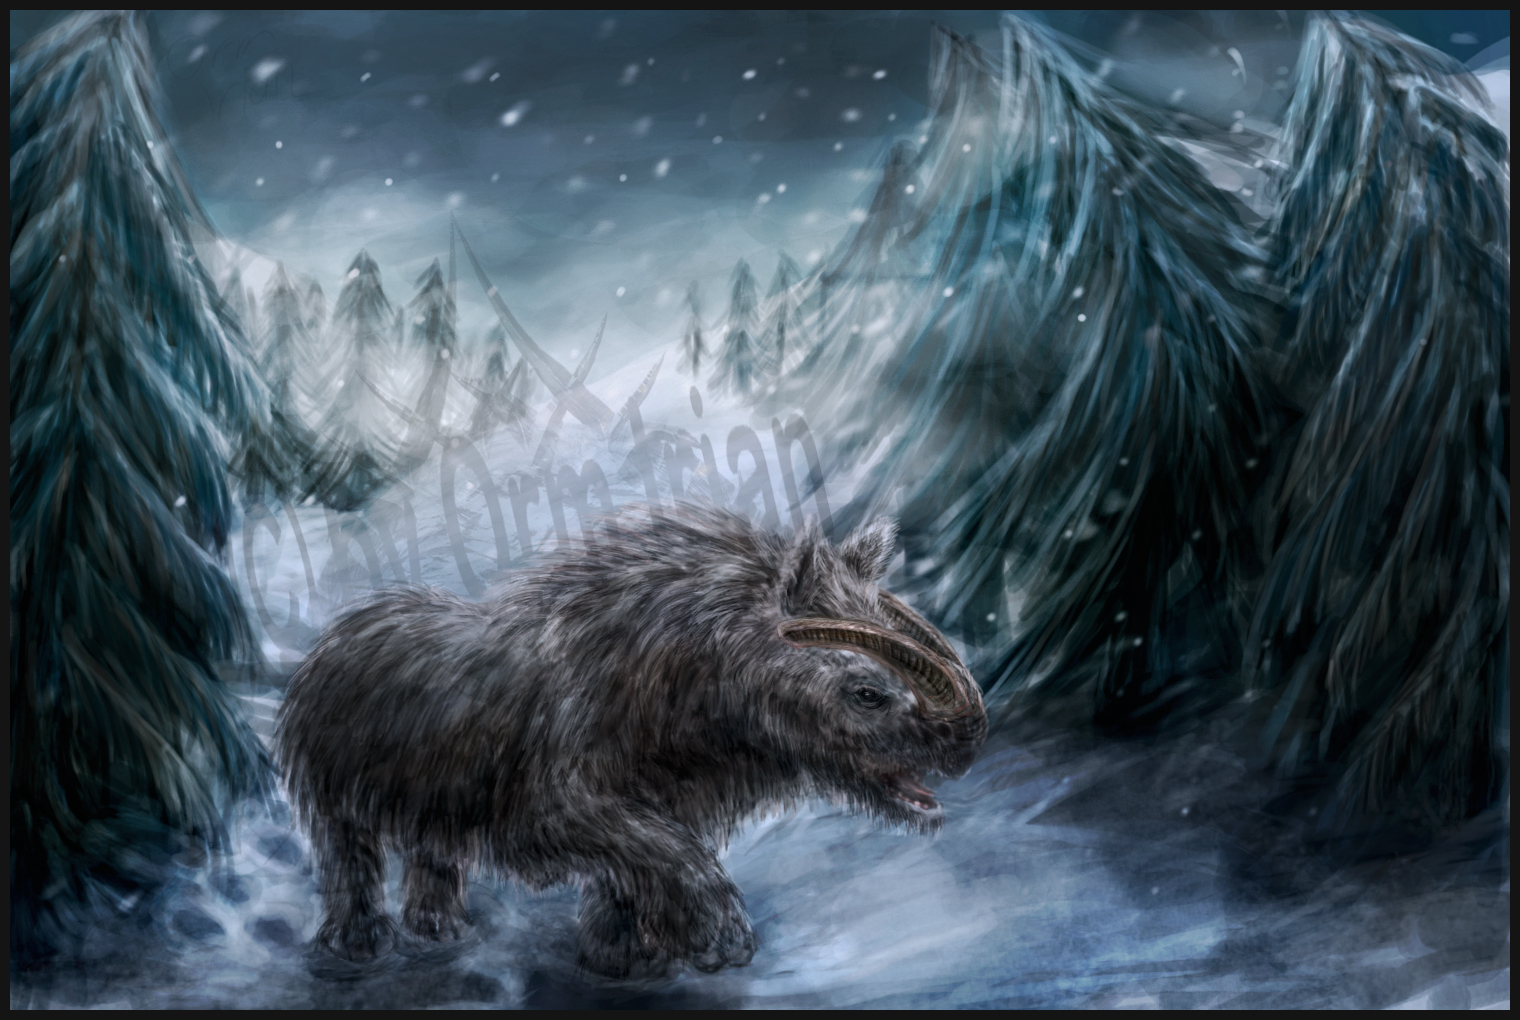 Wandering Alone by OrmIrian on DeviantArt